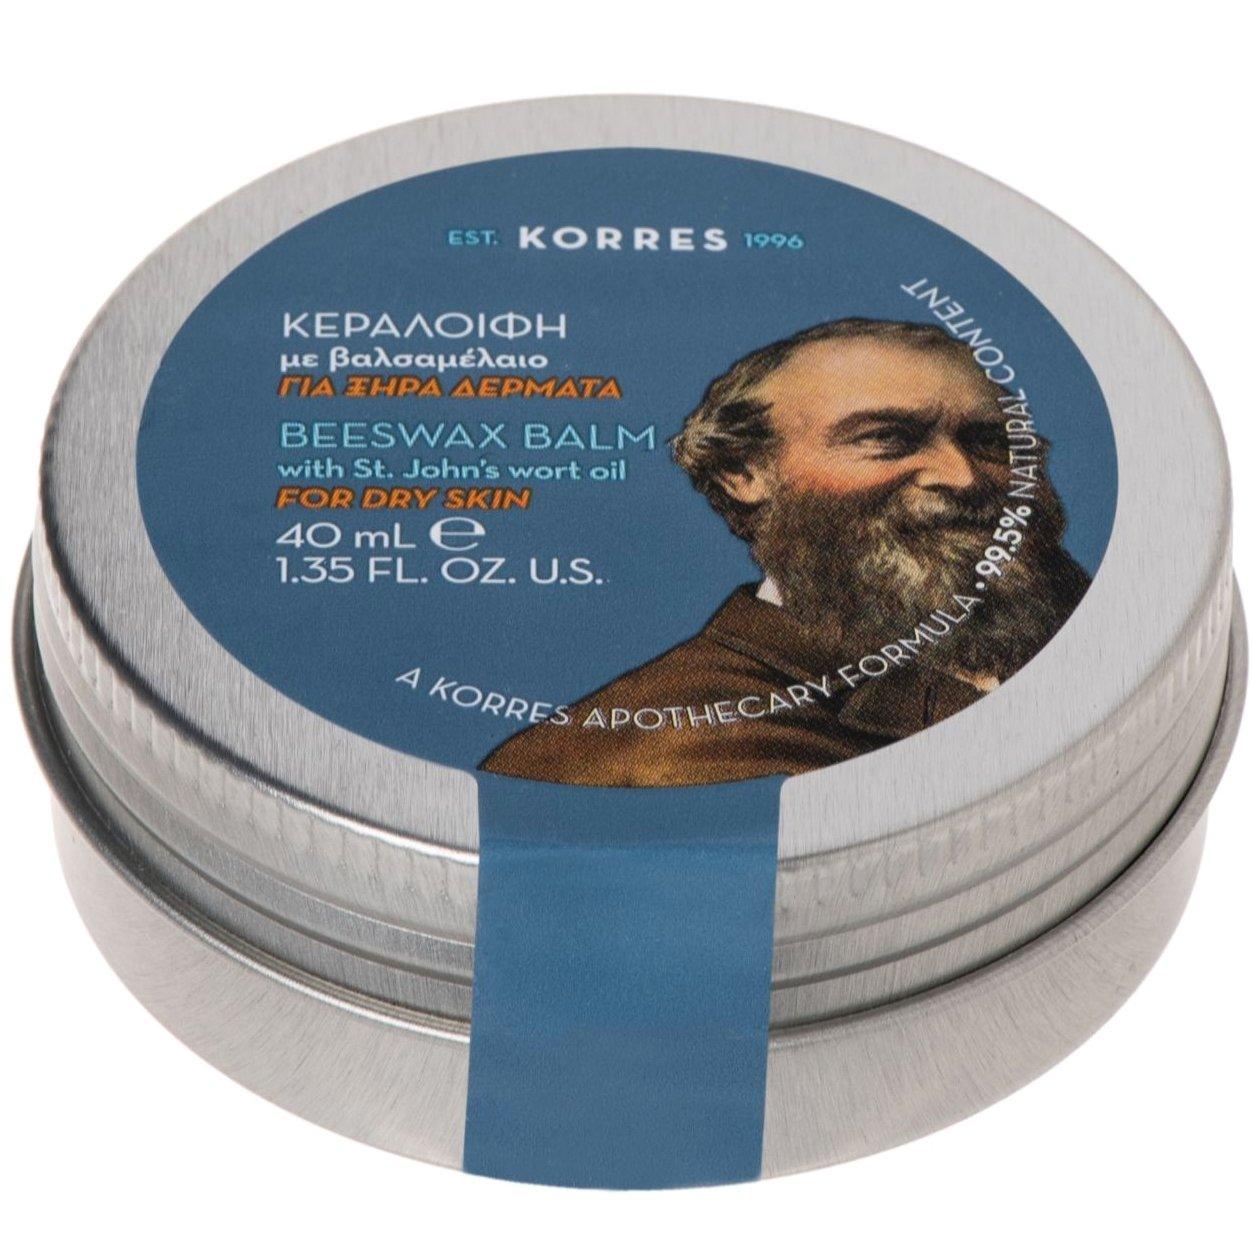 Korres Beeswax Balm with St John's Wort Oil Κεραλοιφή με Βαλσαμέλαιο για Ξηρά Δέρματα 40ml